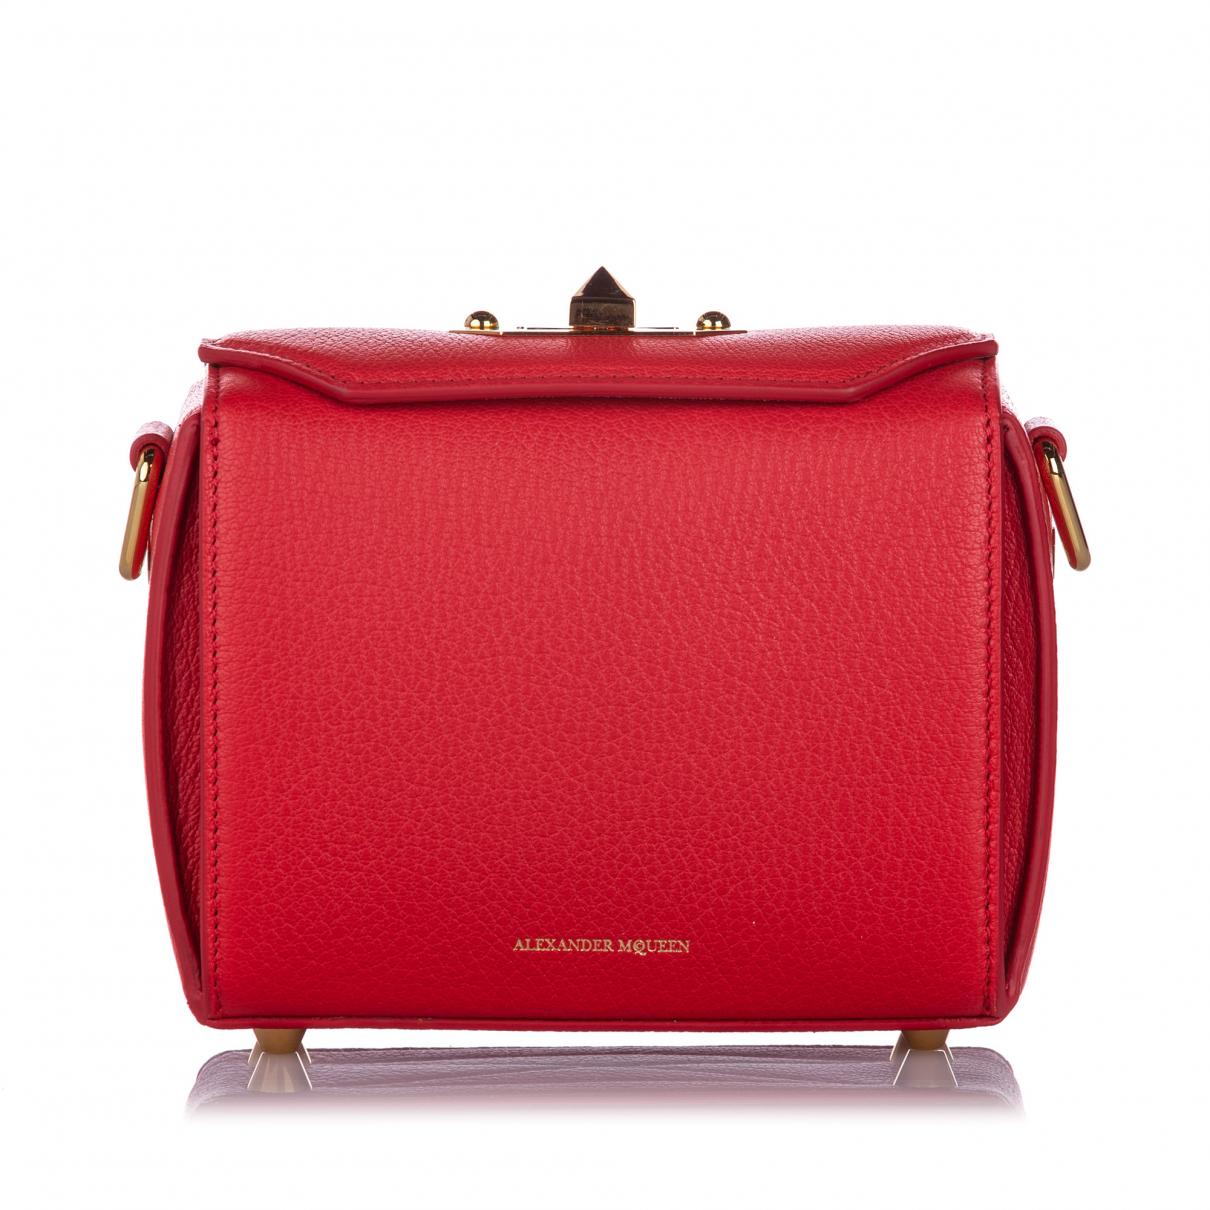 Alexander Mcqueen \N Red Leather handbag for Women \N